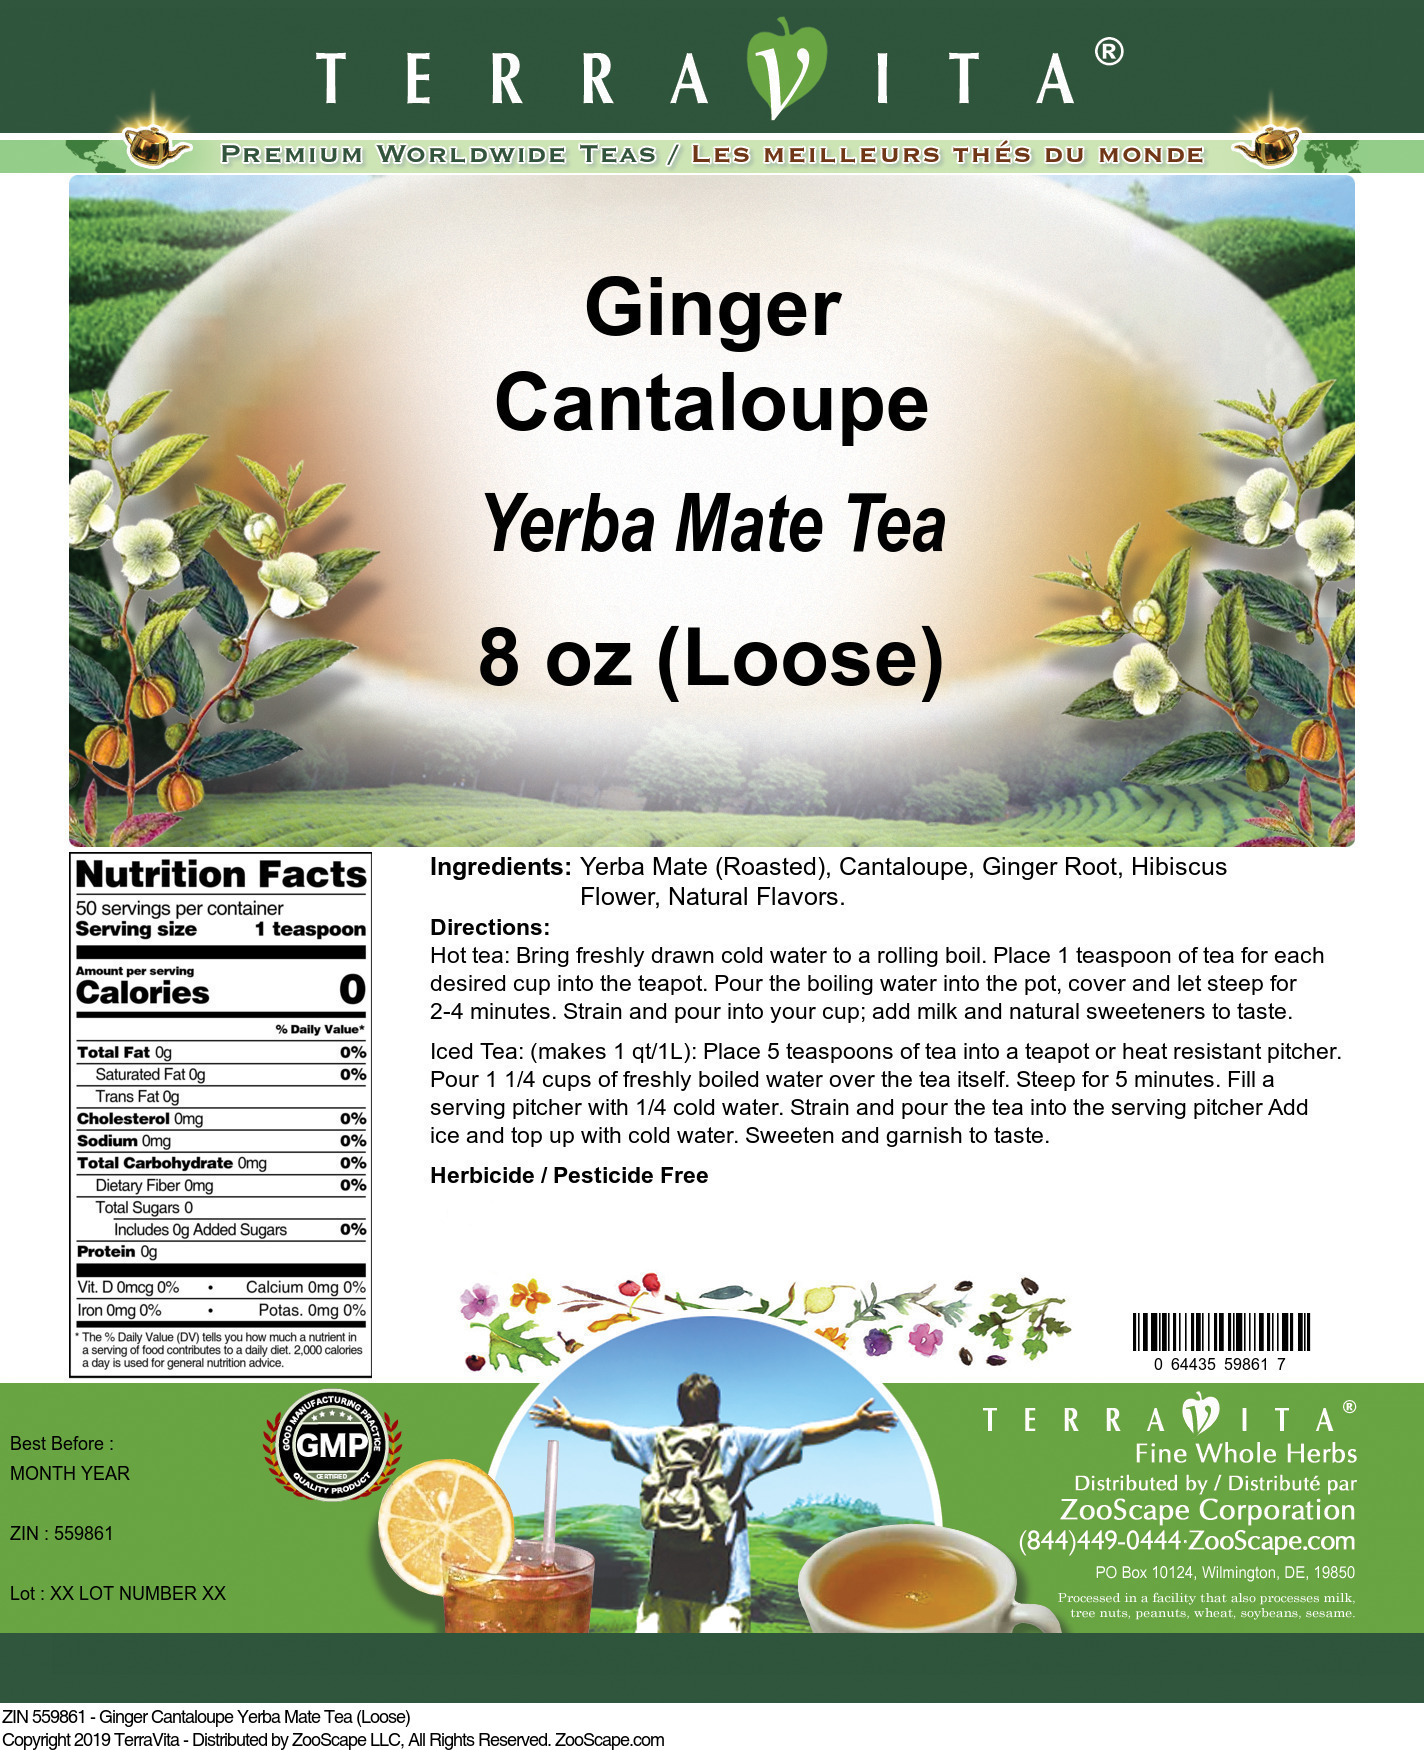 Ginger Cantaloupe Yerba Mate